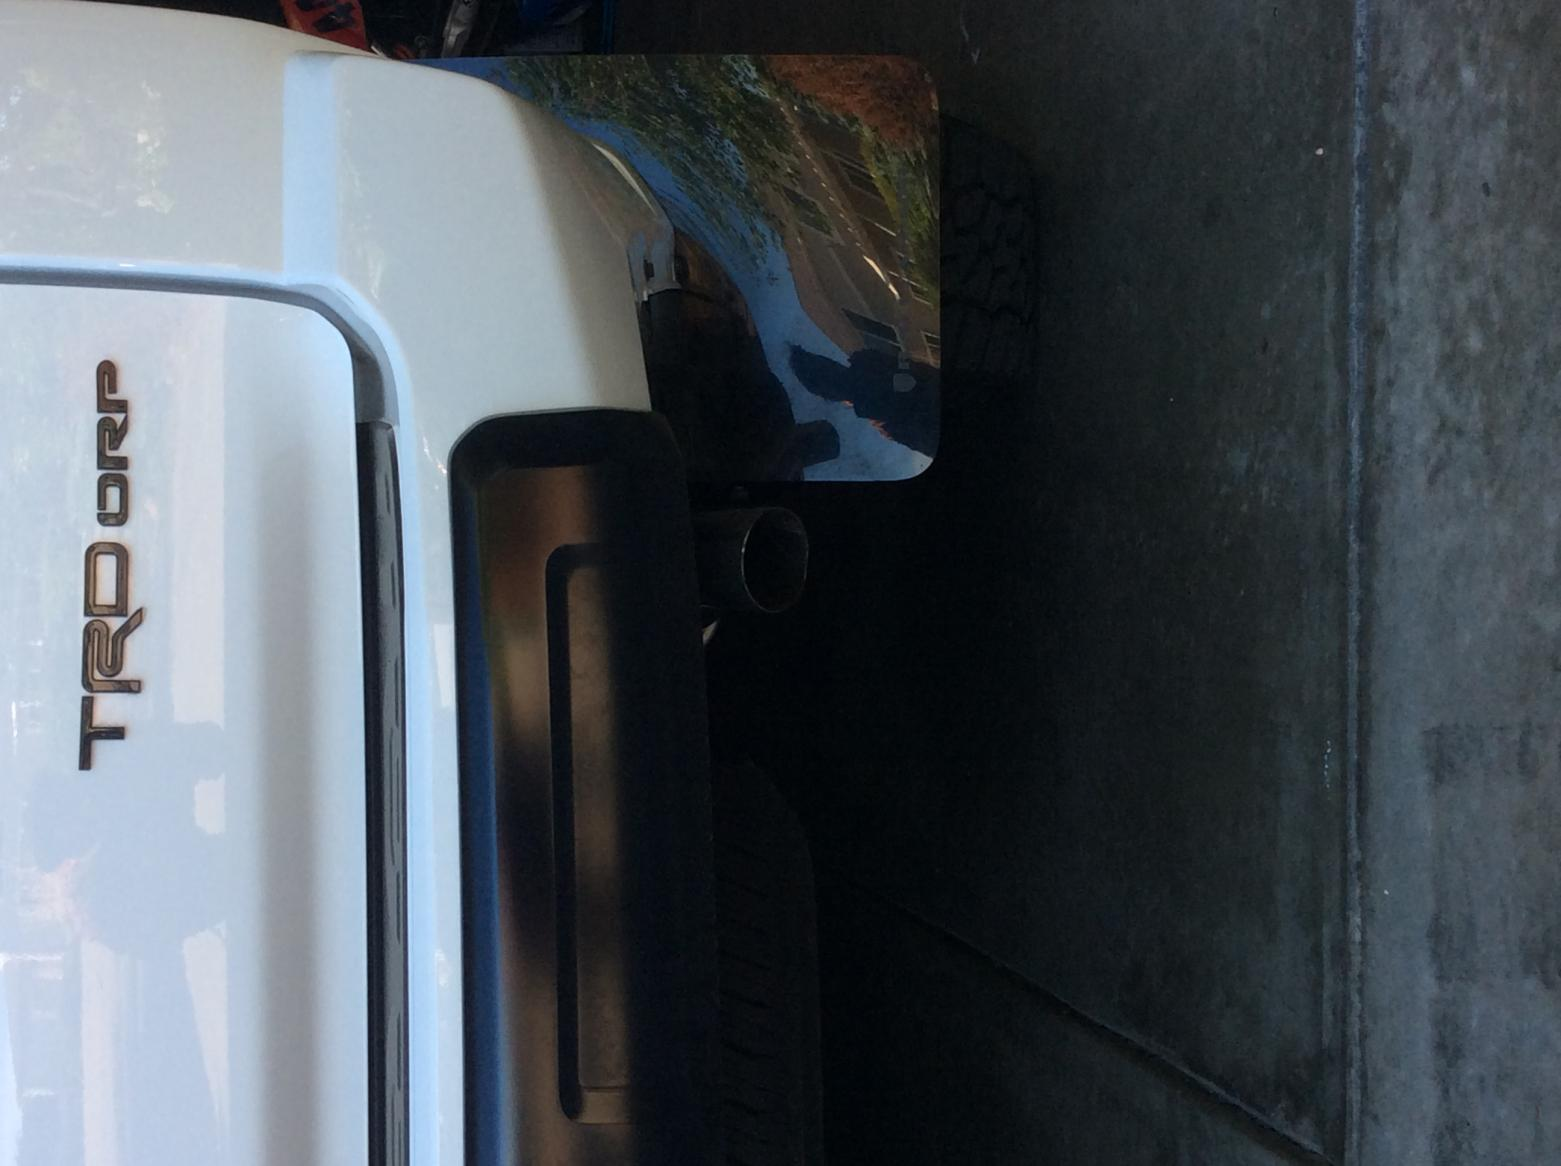 installed- Borla S-Type Cat-Back Exhaust Systems (p/n 140760) 2013 Trail-a3e508aa-7e9e-4f46-8c32-002c047c8b21-jpg